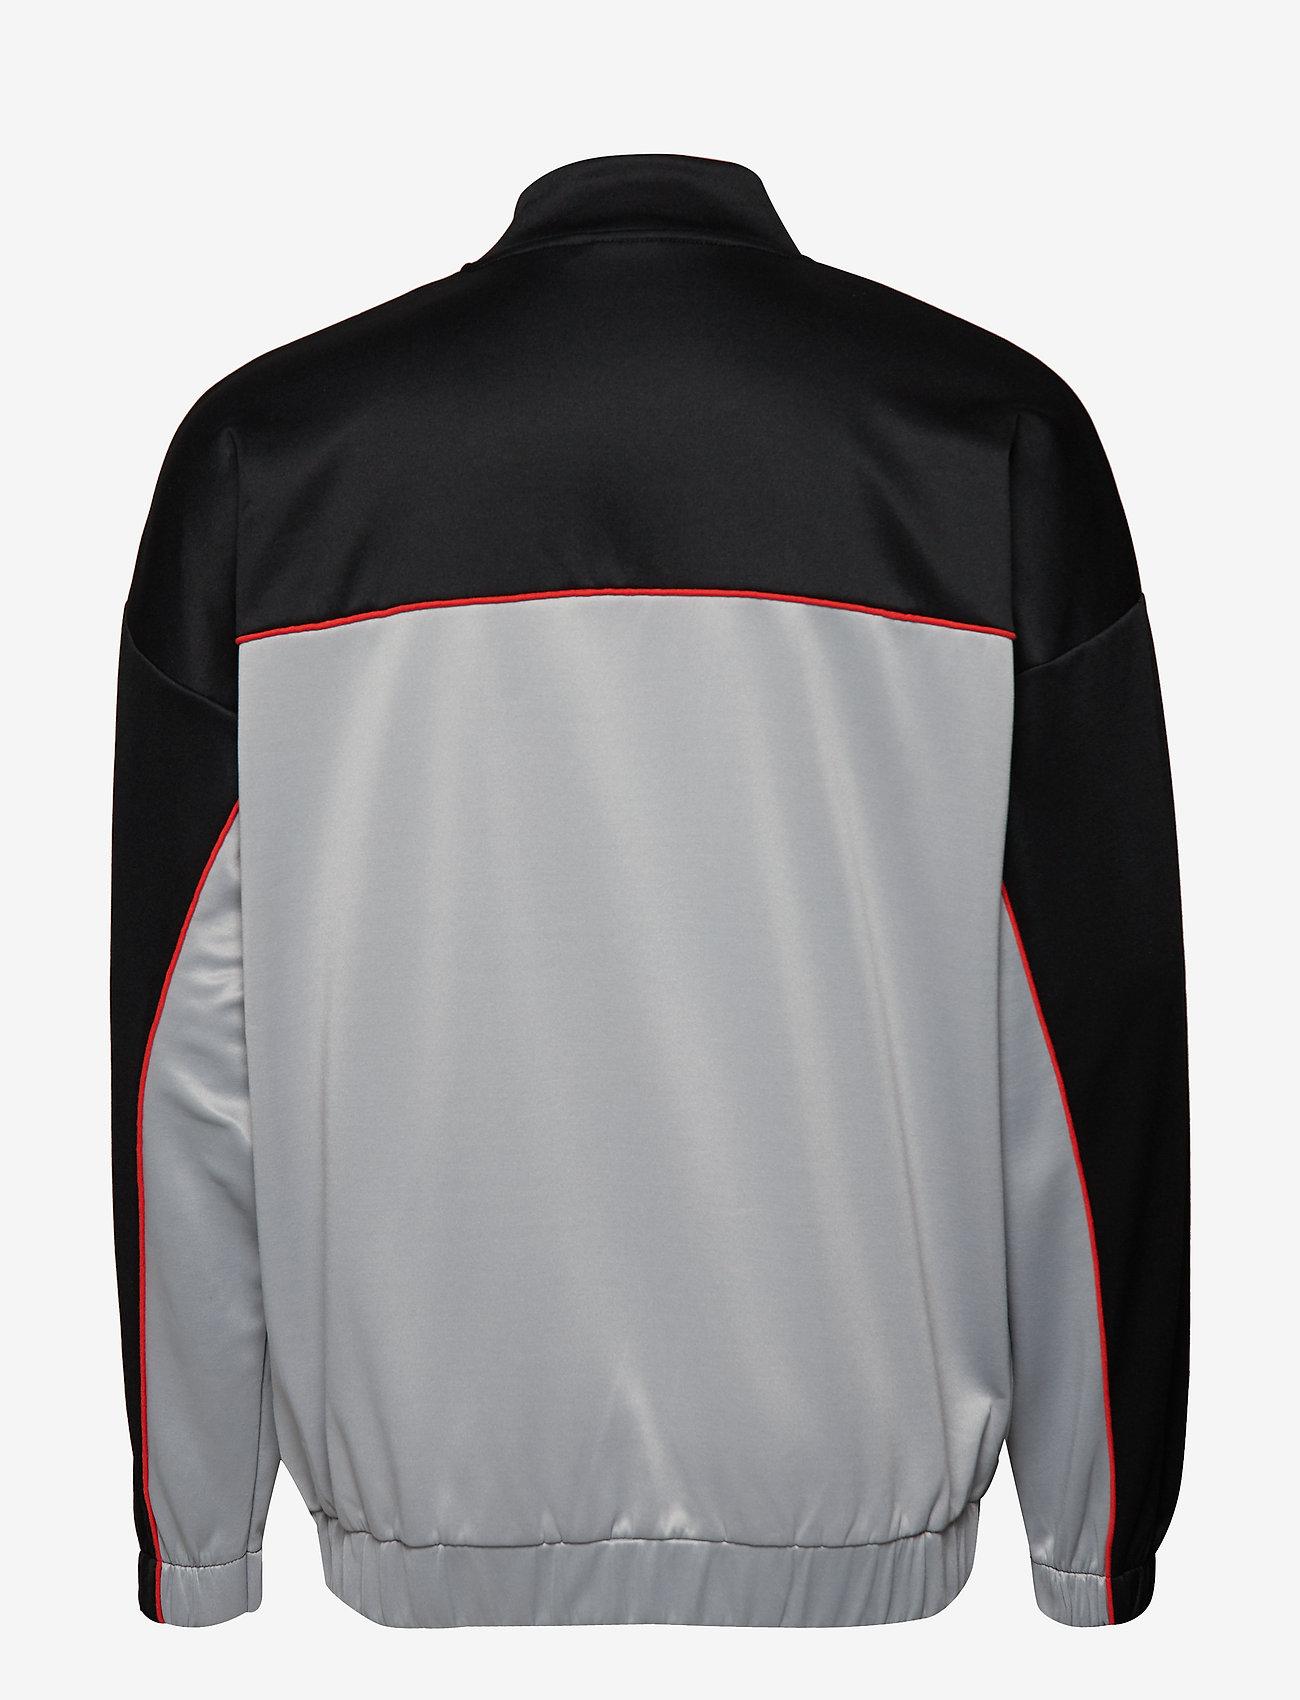 Hmlarne Zip Jacket (Black) - Hummel Hive IN906t